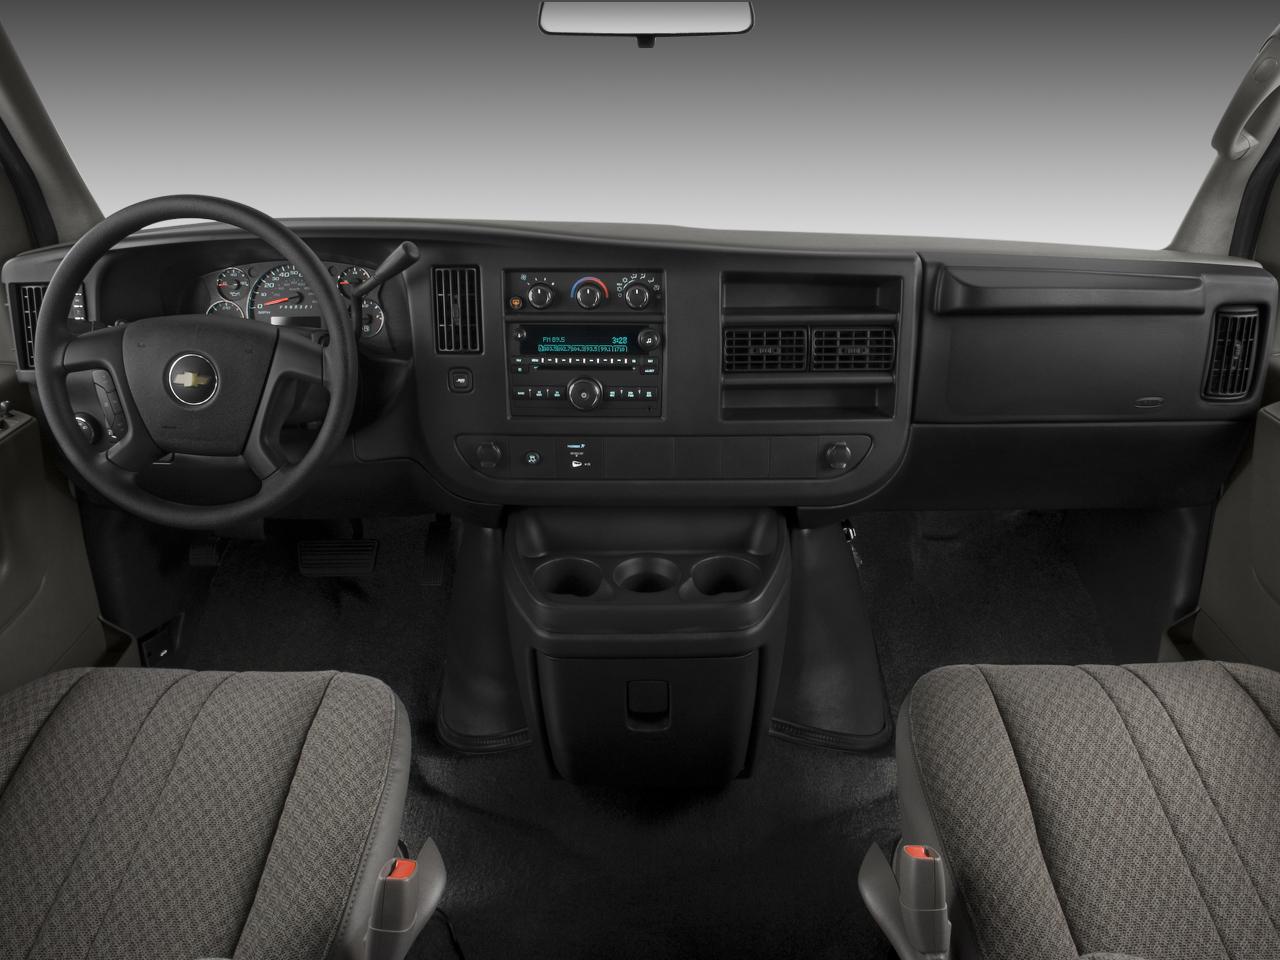 2009 Chevrolet Express 9